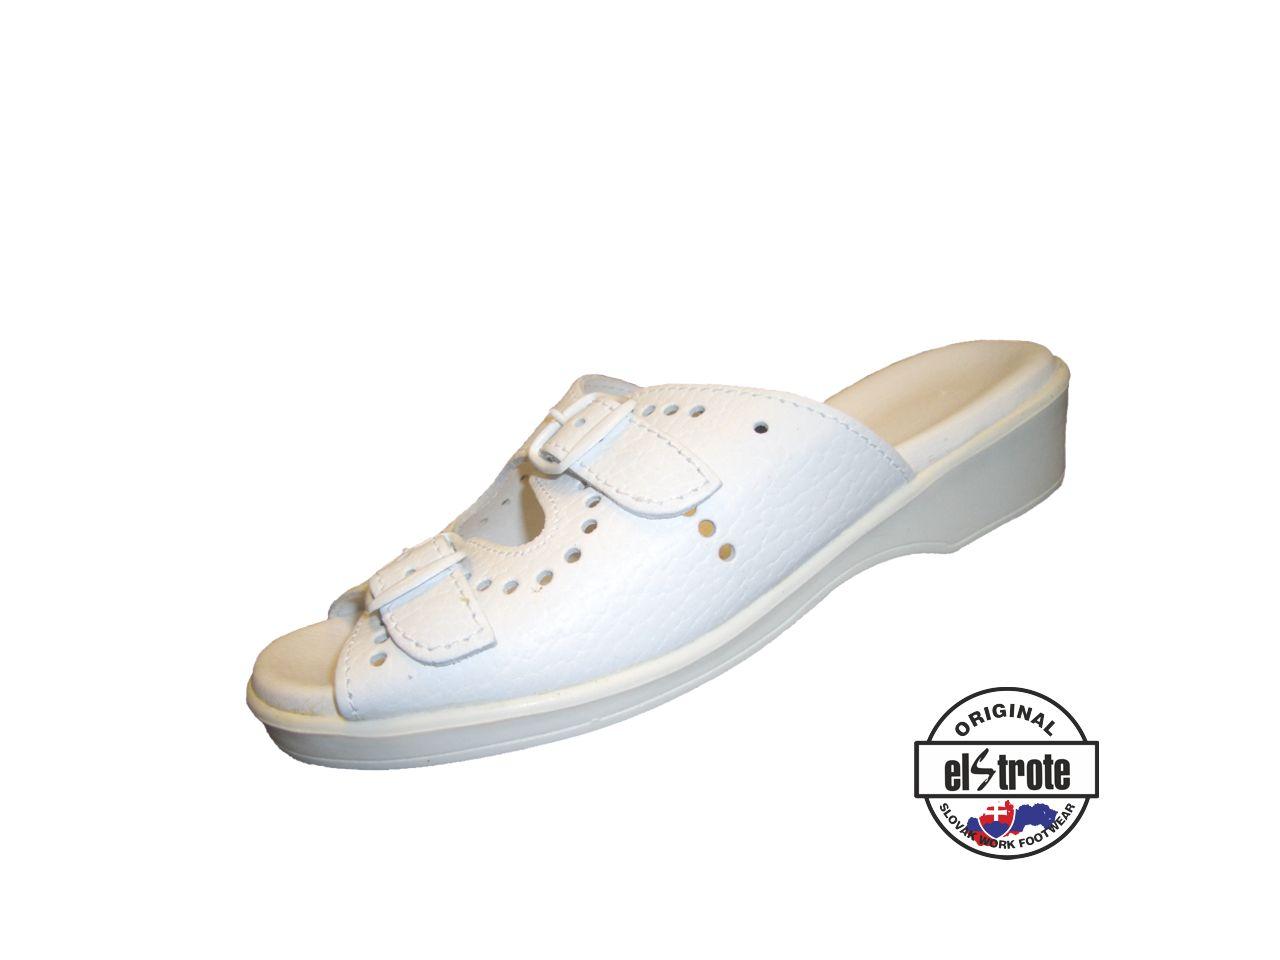 f07c368eec65 Zdravotná pracovná obuv classic - dámske sandále - 91 532 f.10